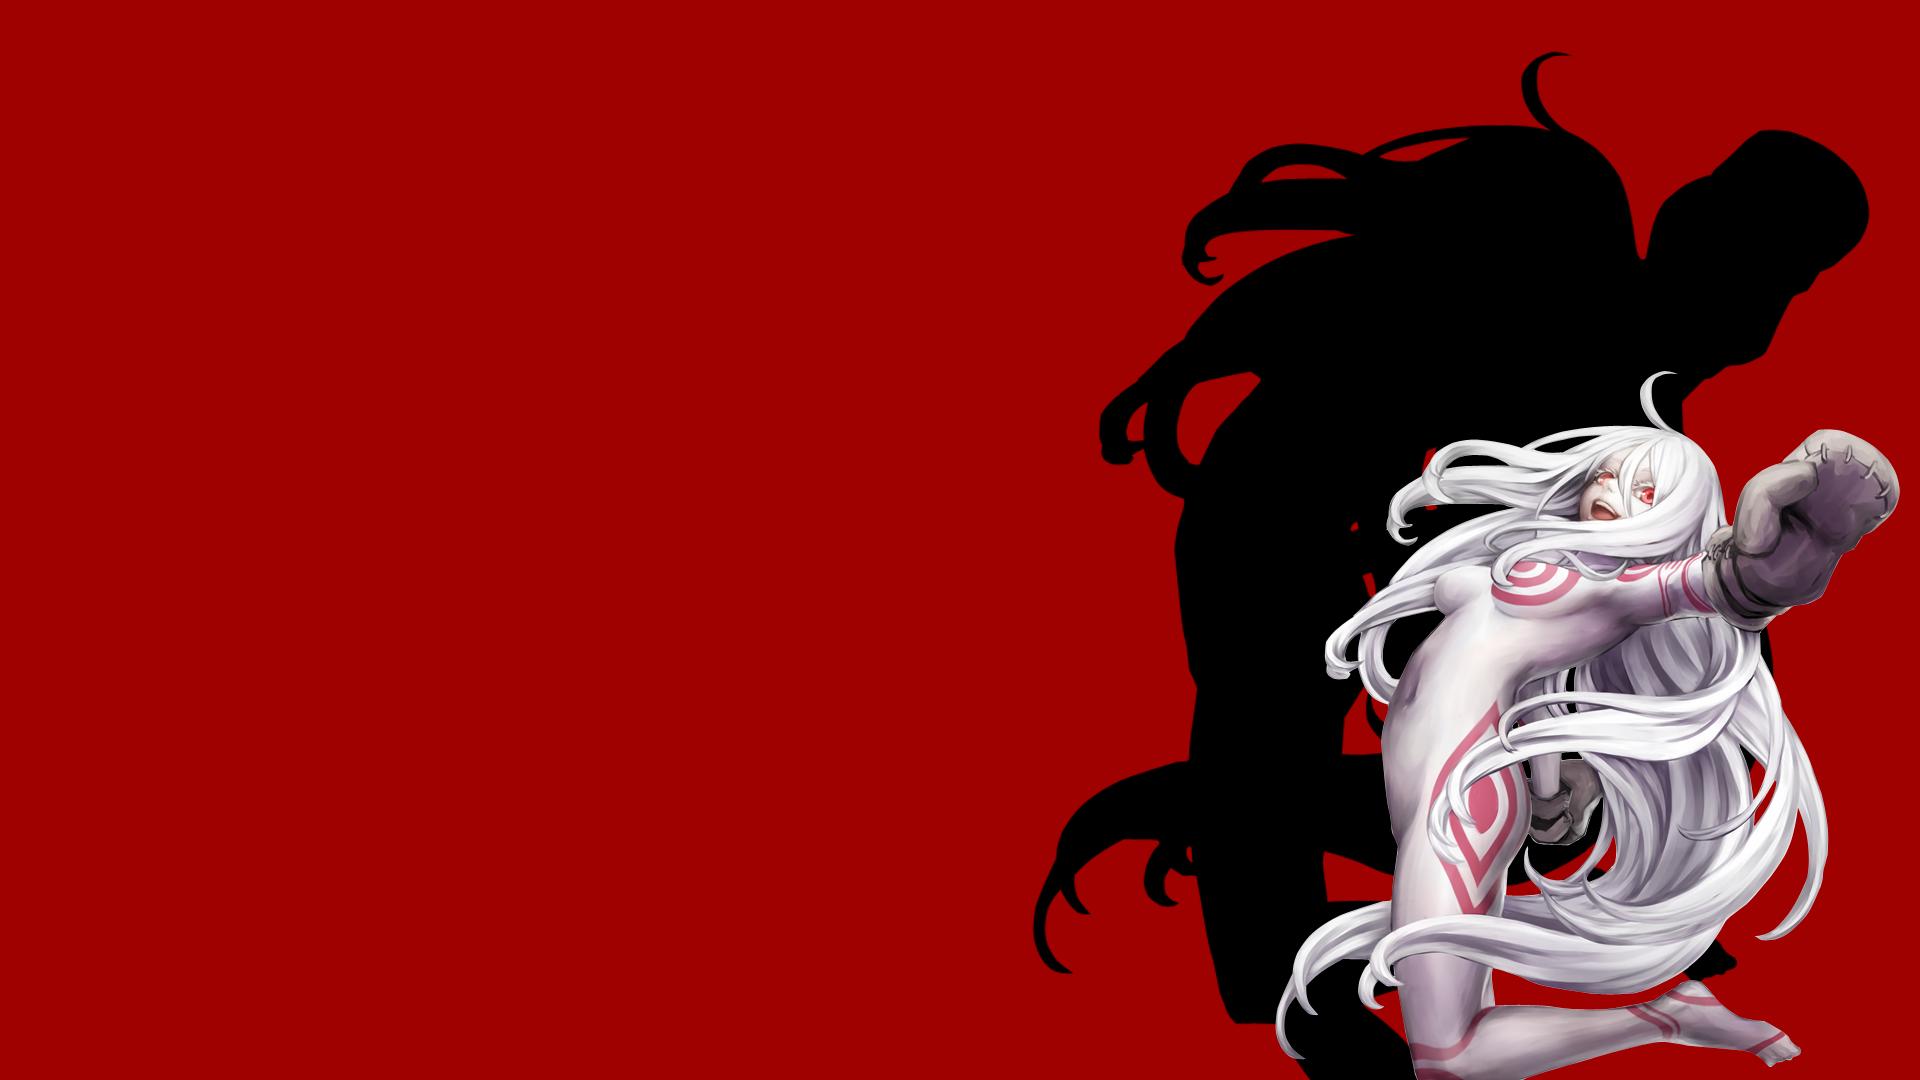 deadman wonderland shiro wallpaper - photo #14